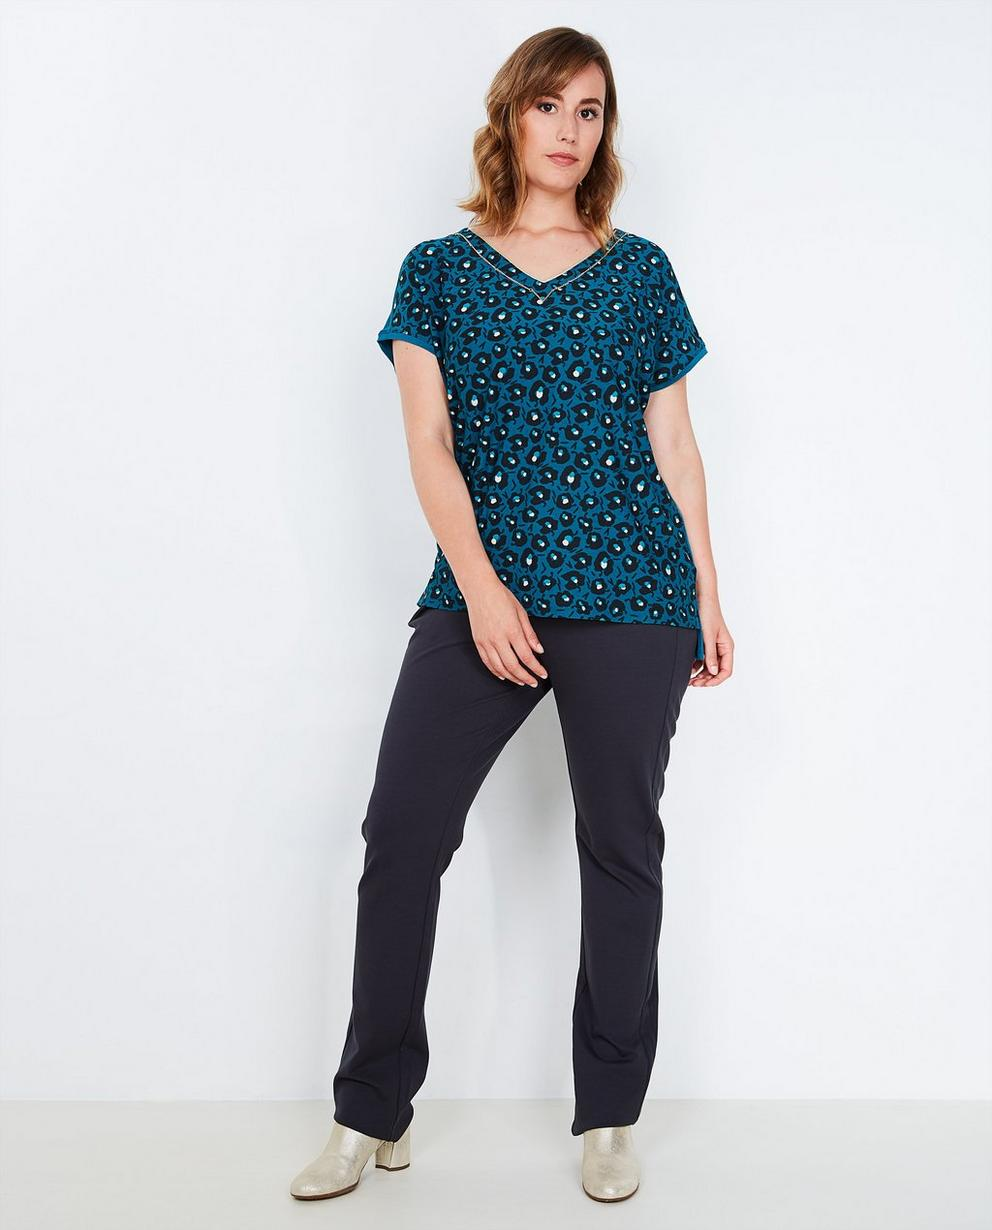 Pantalon bleu stretchy  - avec un biais noir - Lena Lena